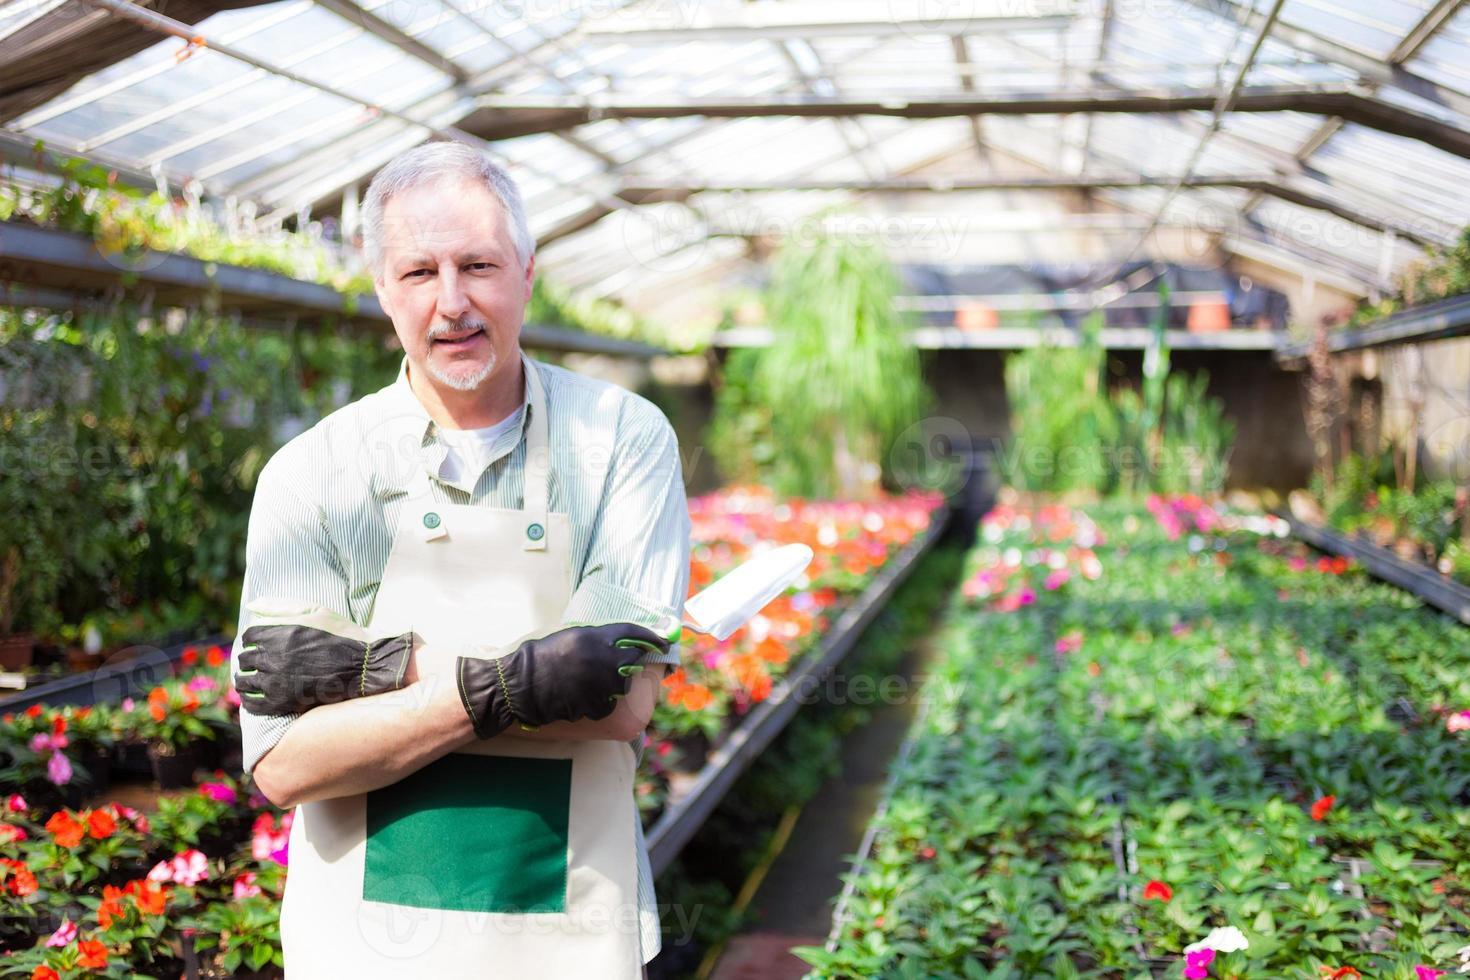 Greenhouse worker photo